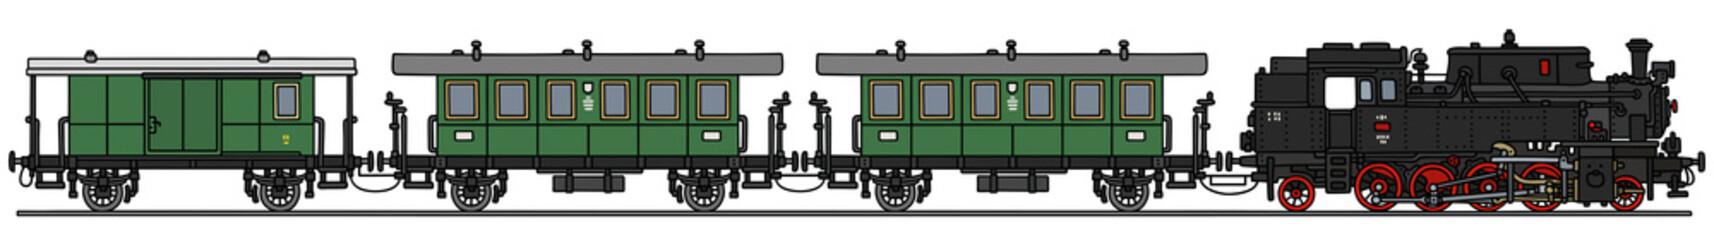 Steam train / Hand drawing, vector illustration